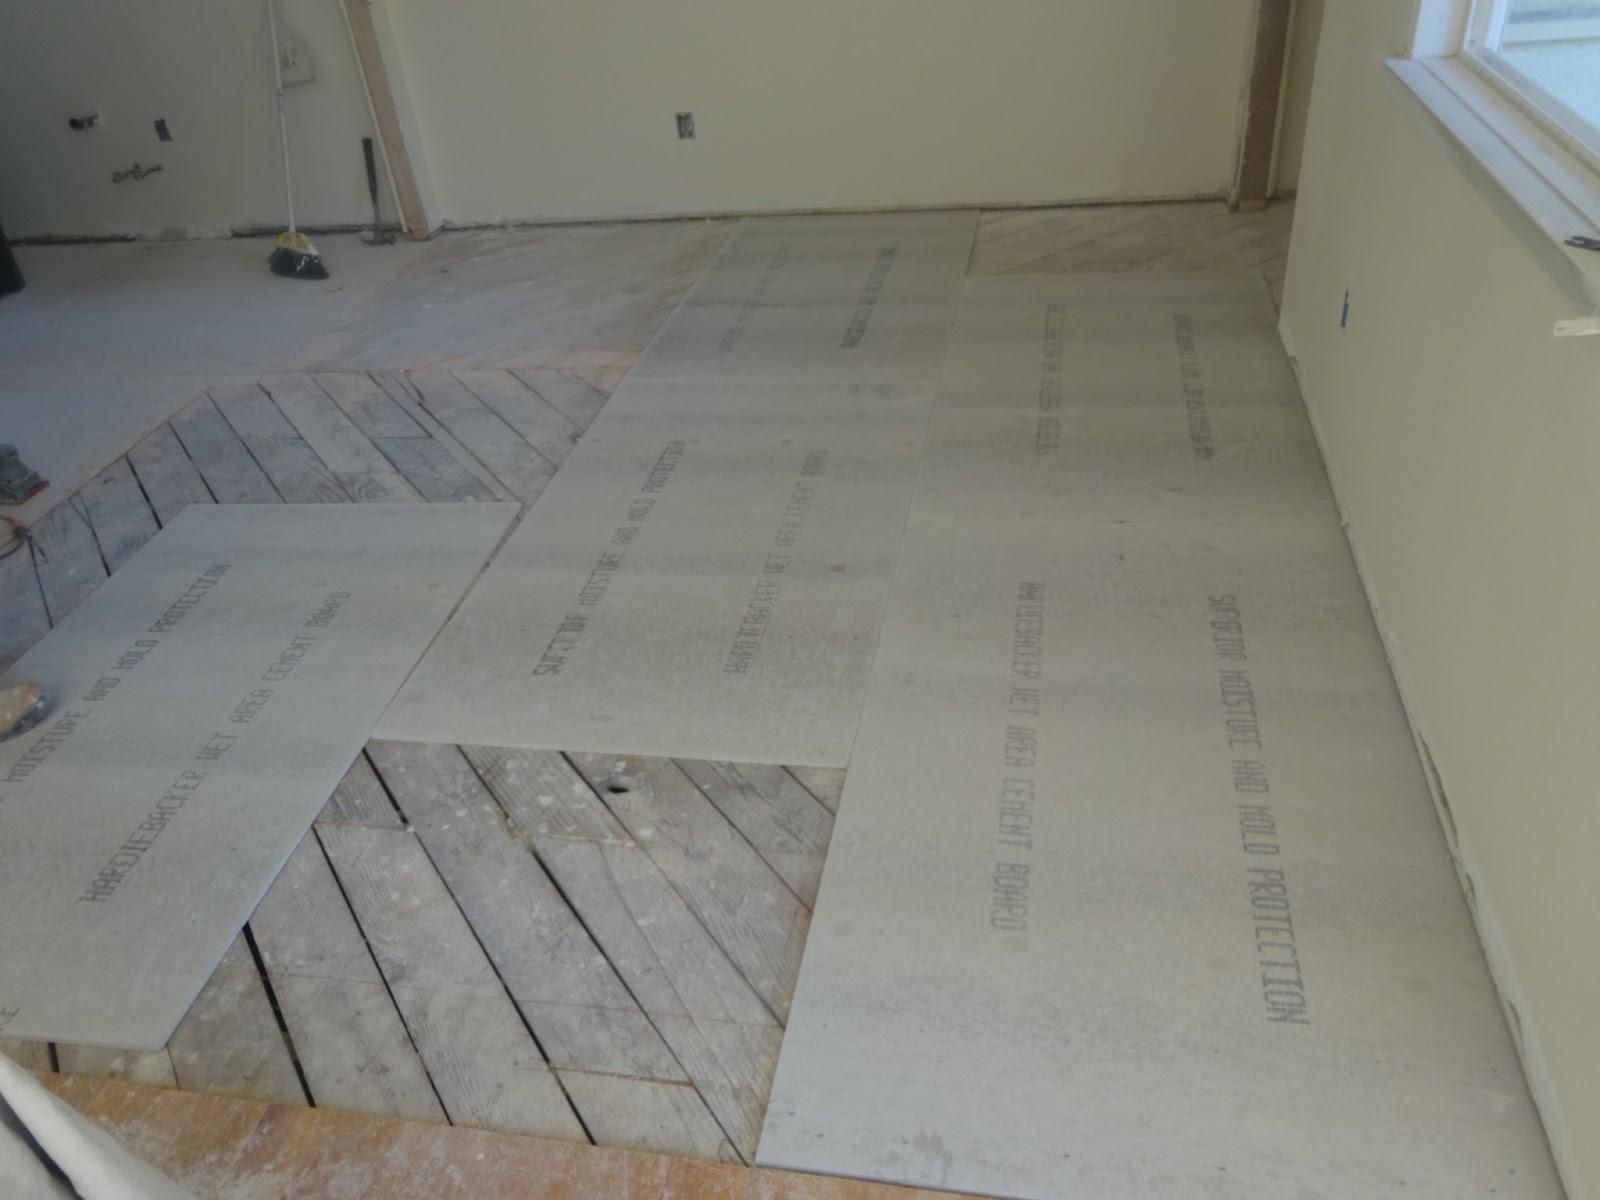 Building A Handyman July - Thin backer board for floor tile